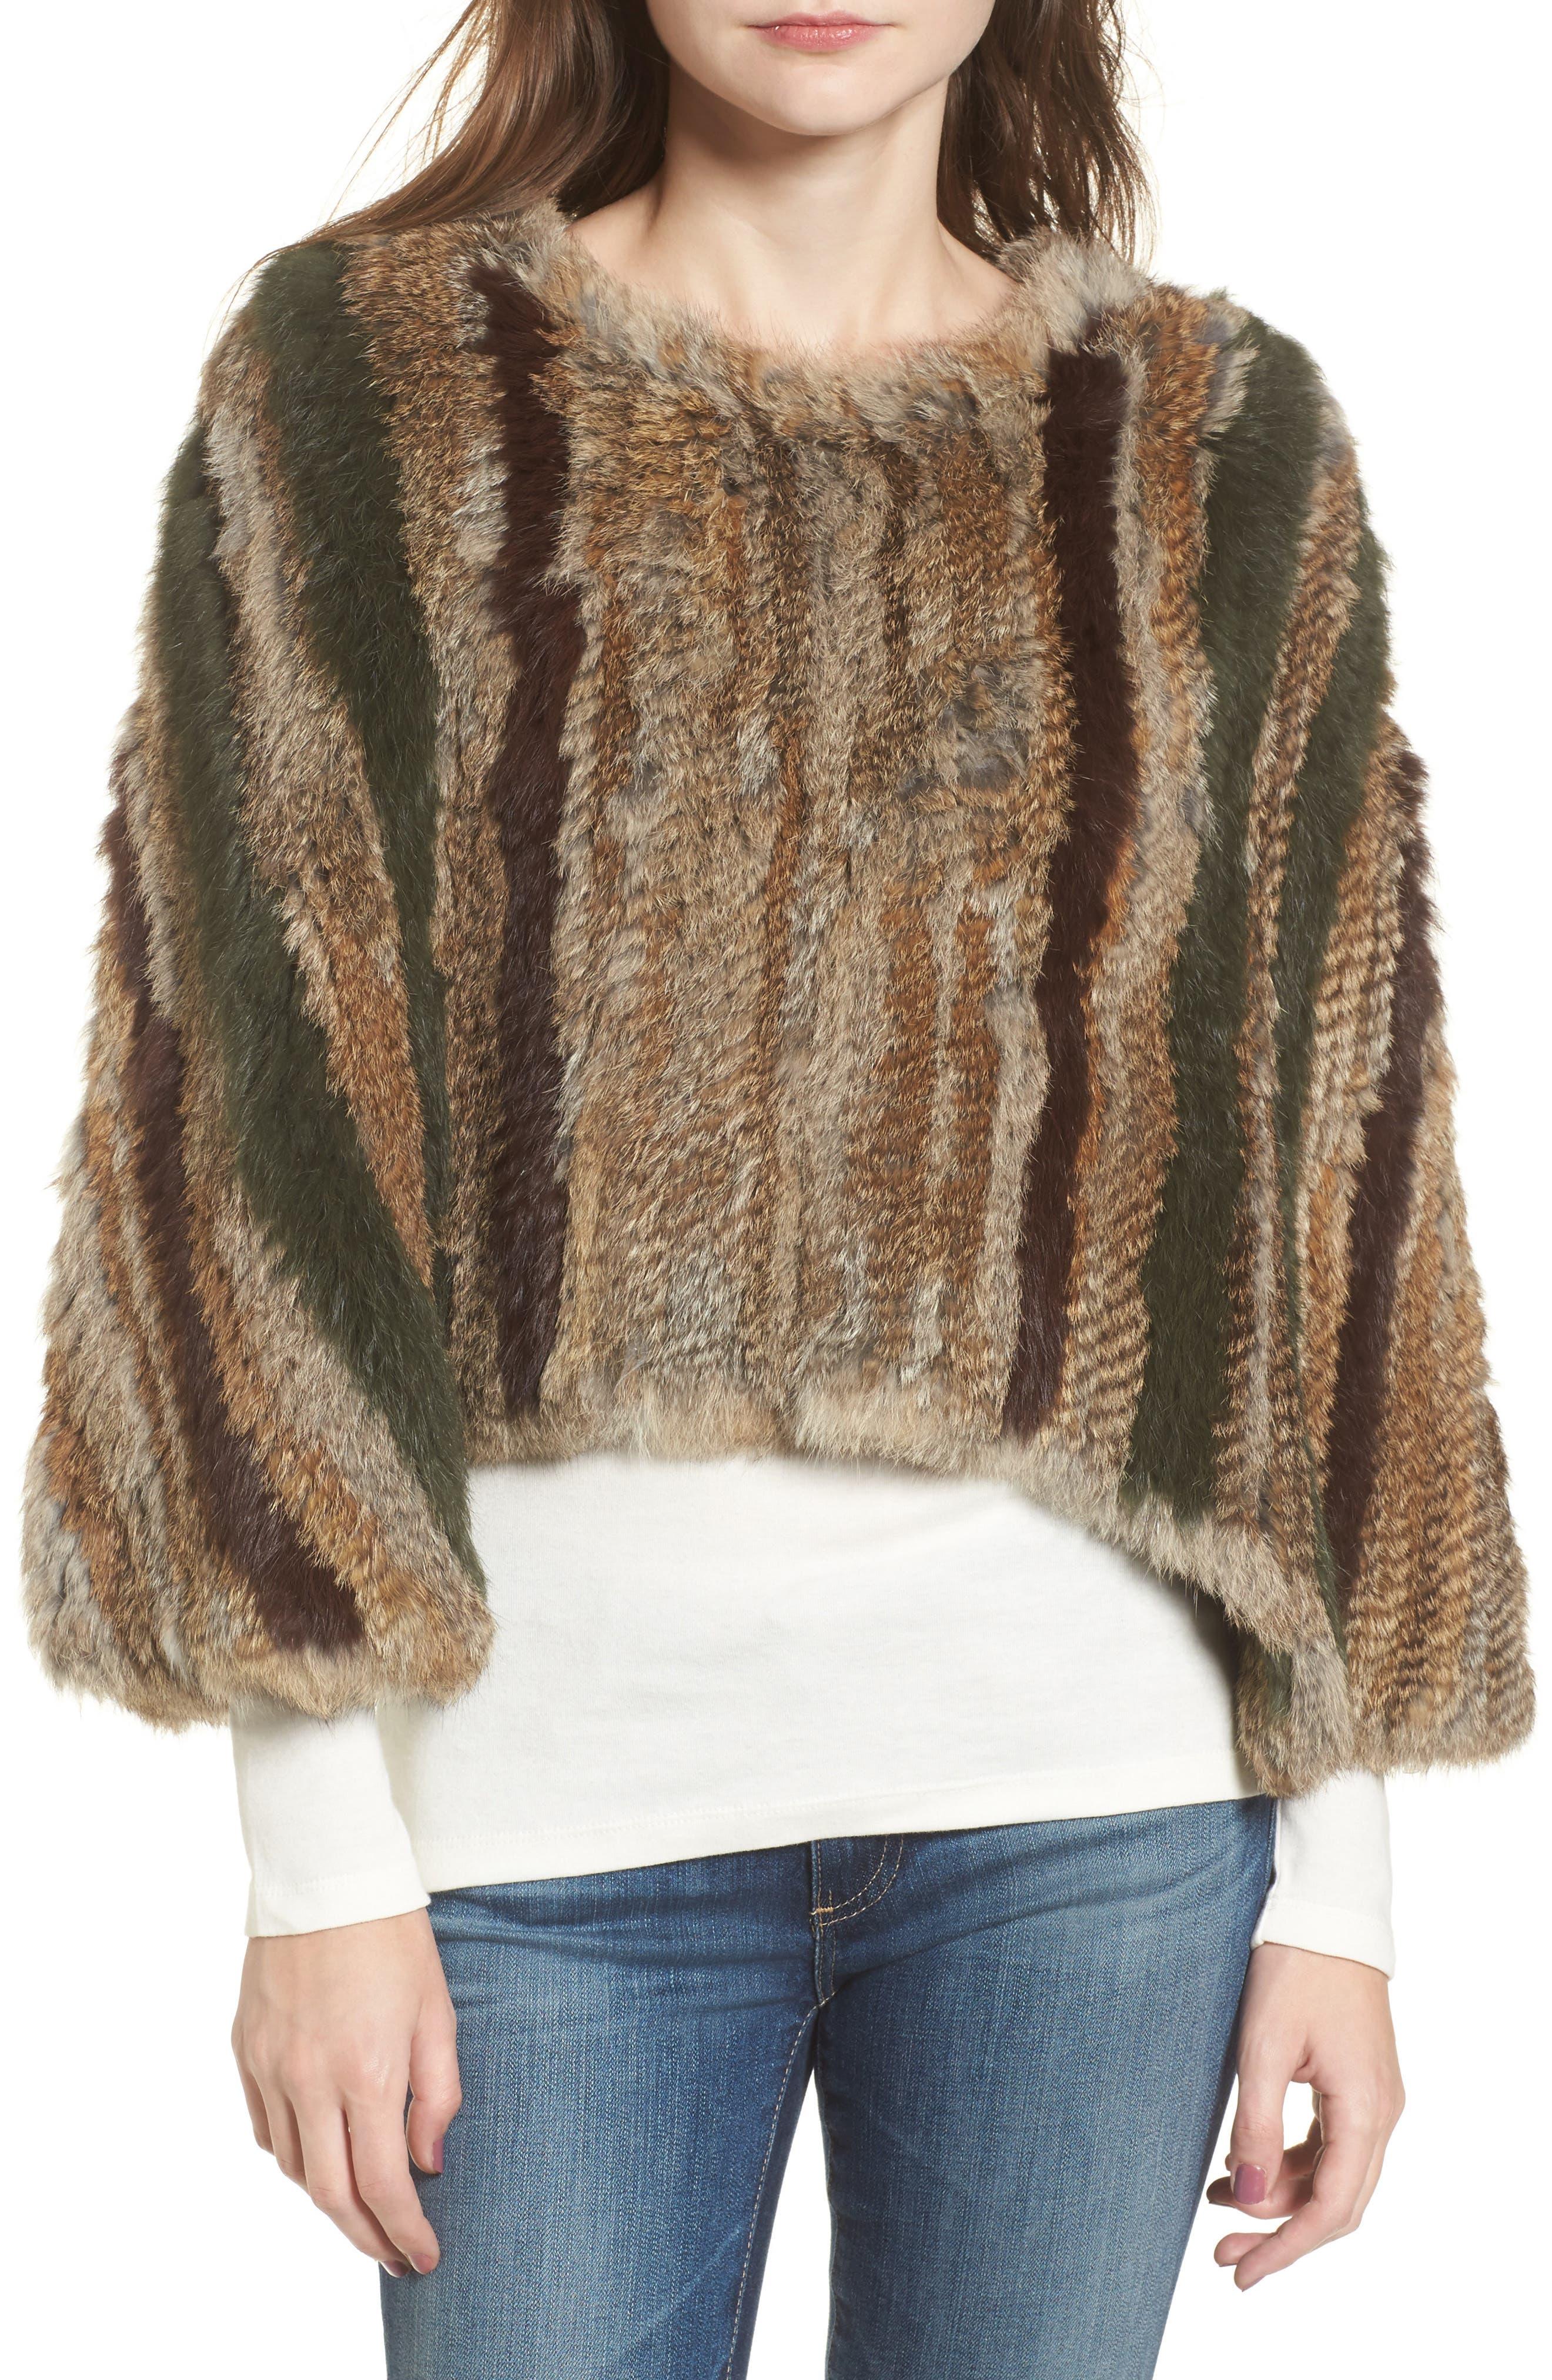 BNCI Nomad Genuine Rabbit Fur Pullover,                         Main,                         color, 208